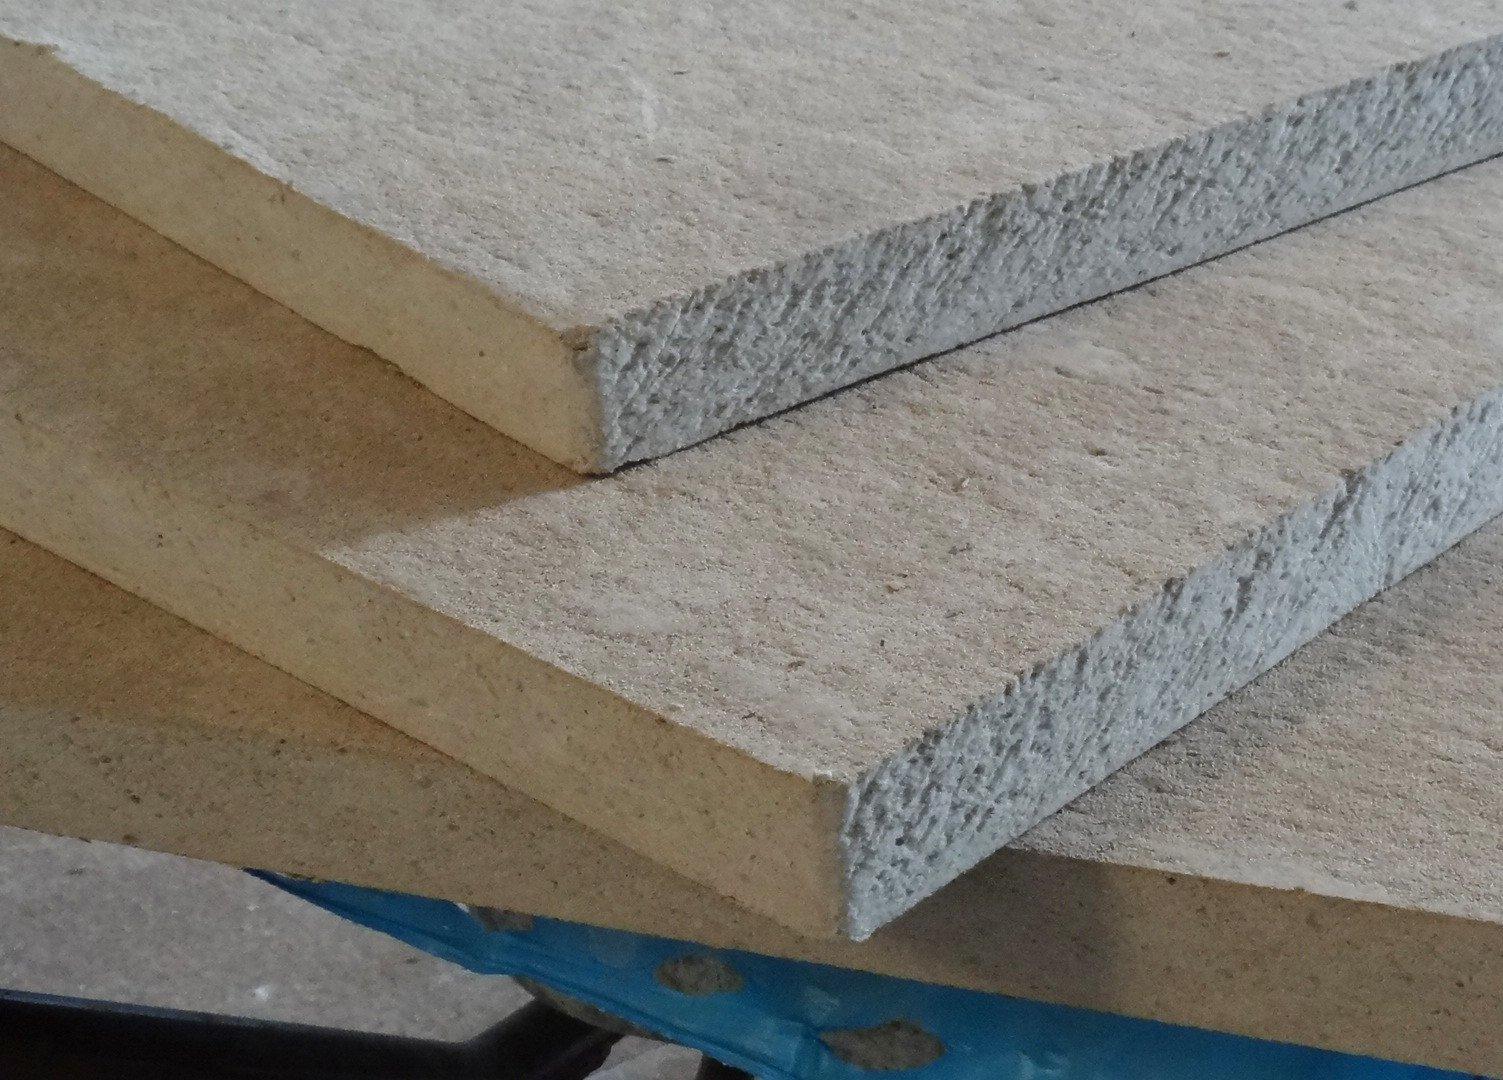 Fußboden Dämmen Platten ~ Nicht brennbare dämmplatten für fußböden brandschutz news